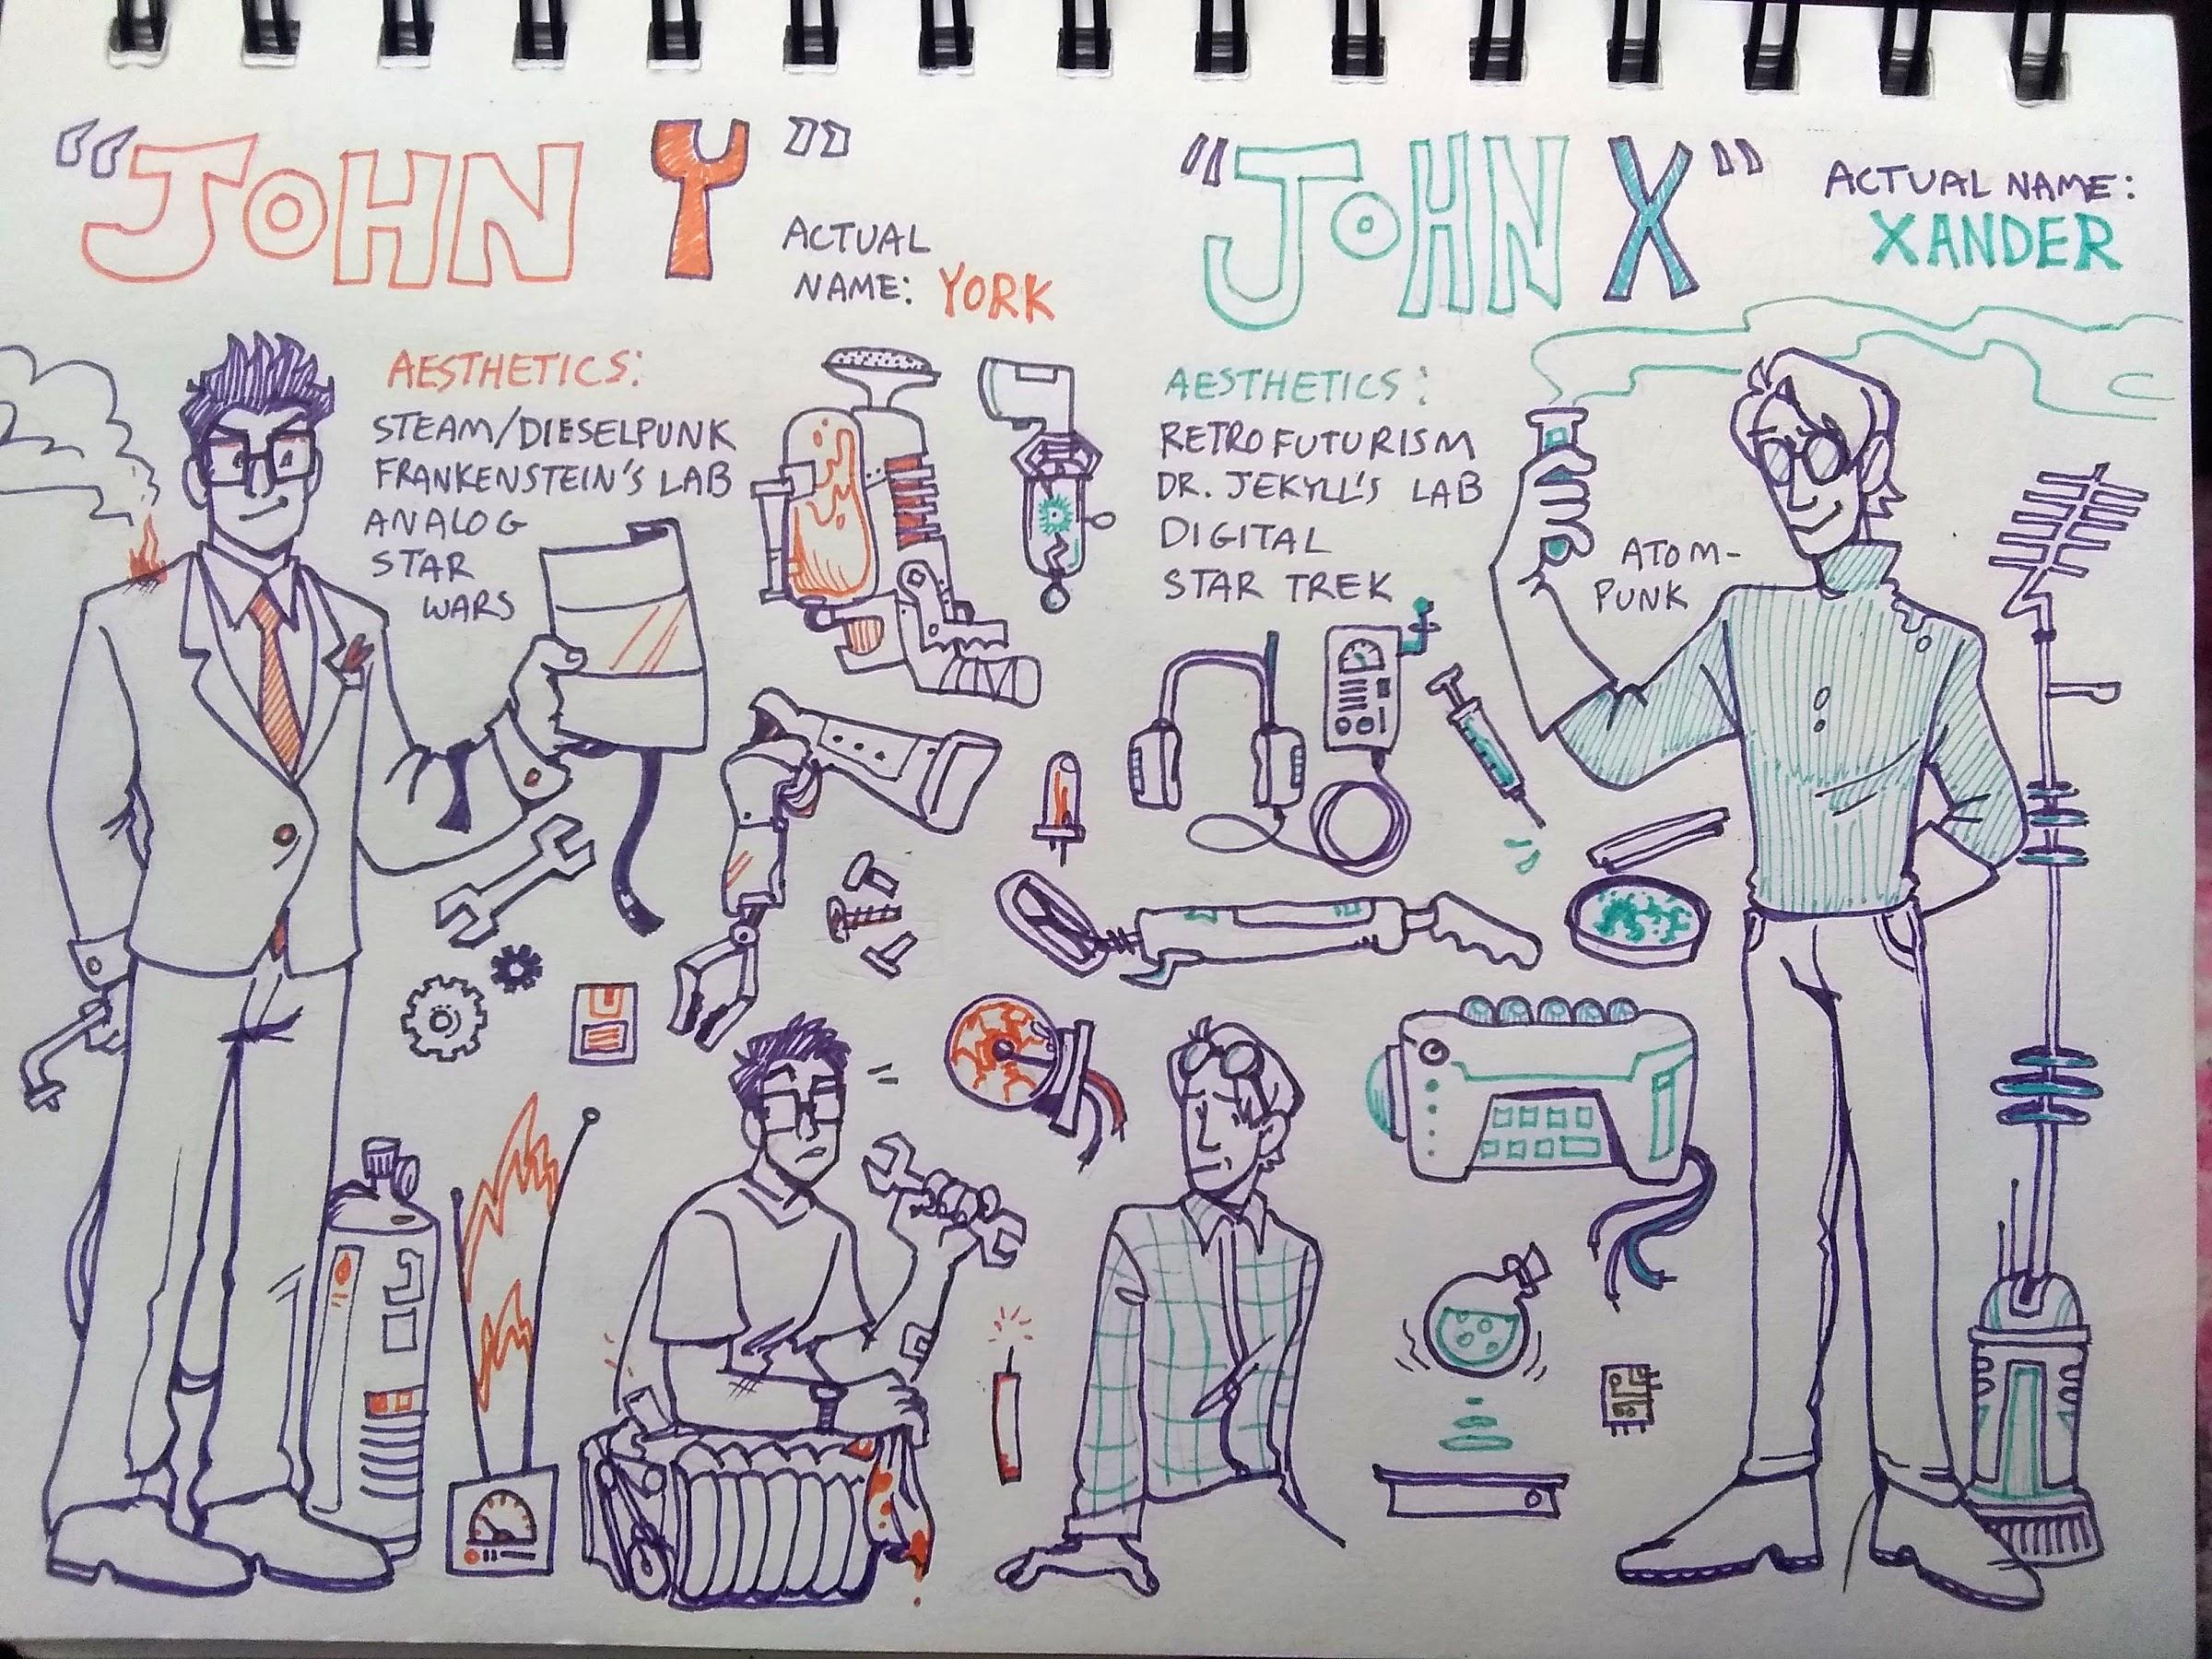 X and Y's distinct tech styles. Y is steam/dieselpunk, analog, star wars; Y is retrofuturist, digital, star trek.